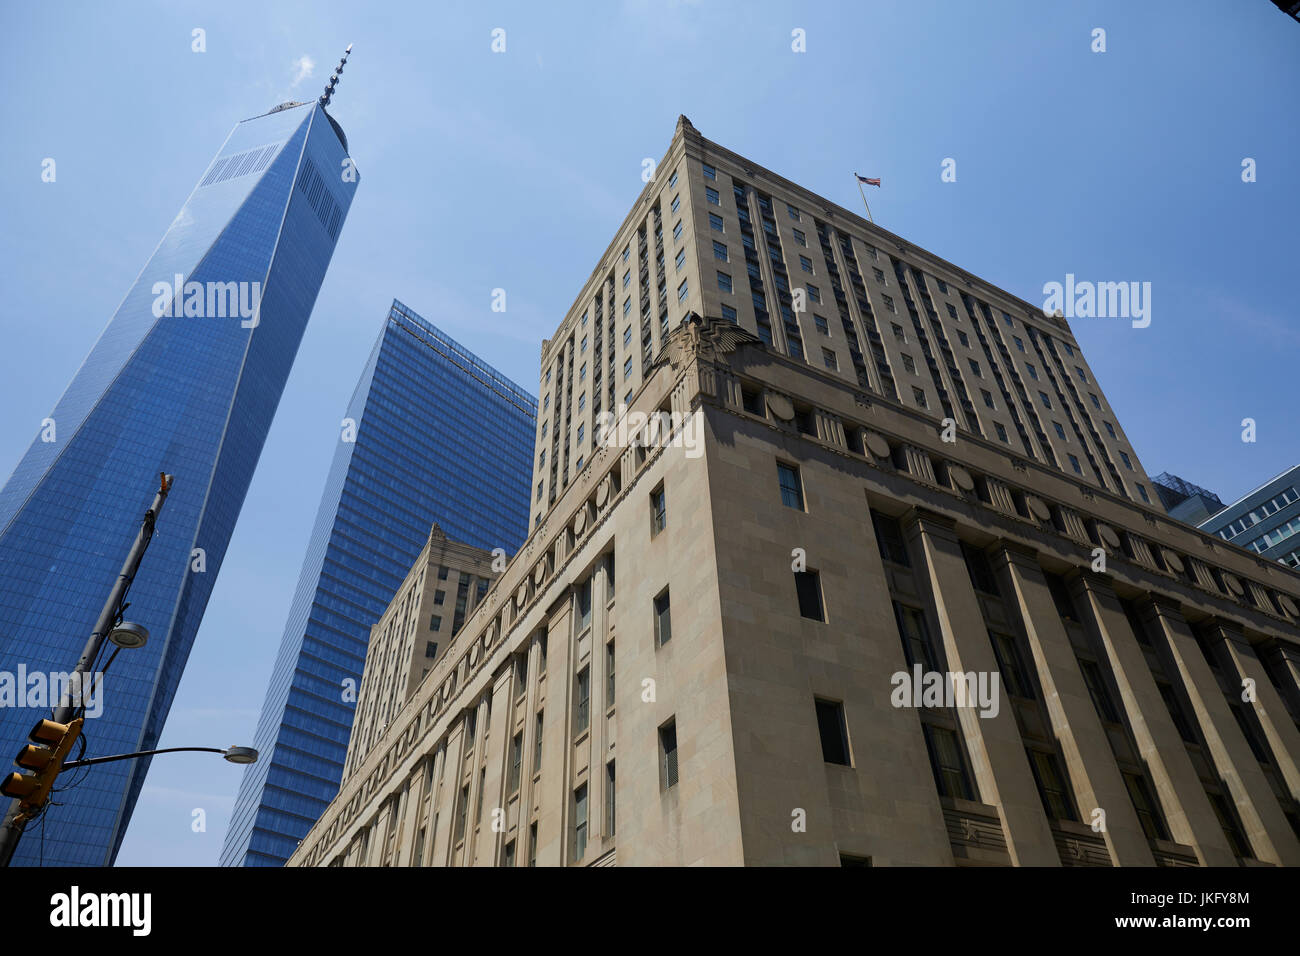 La ville de New York, Manhattan, United States Postal Service building Downtown NYC et One World Trade Center de Photo Stock